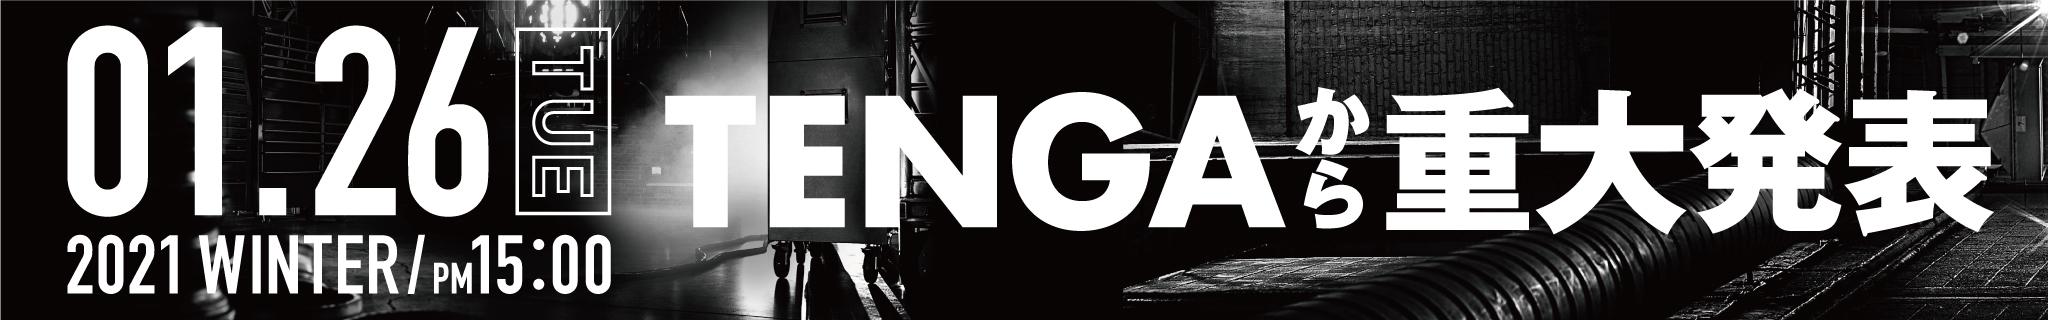 2021/01/26 TENGAから重大発表